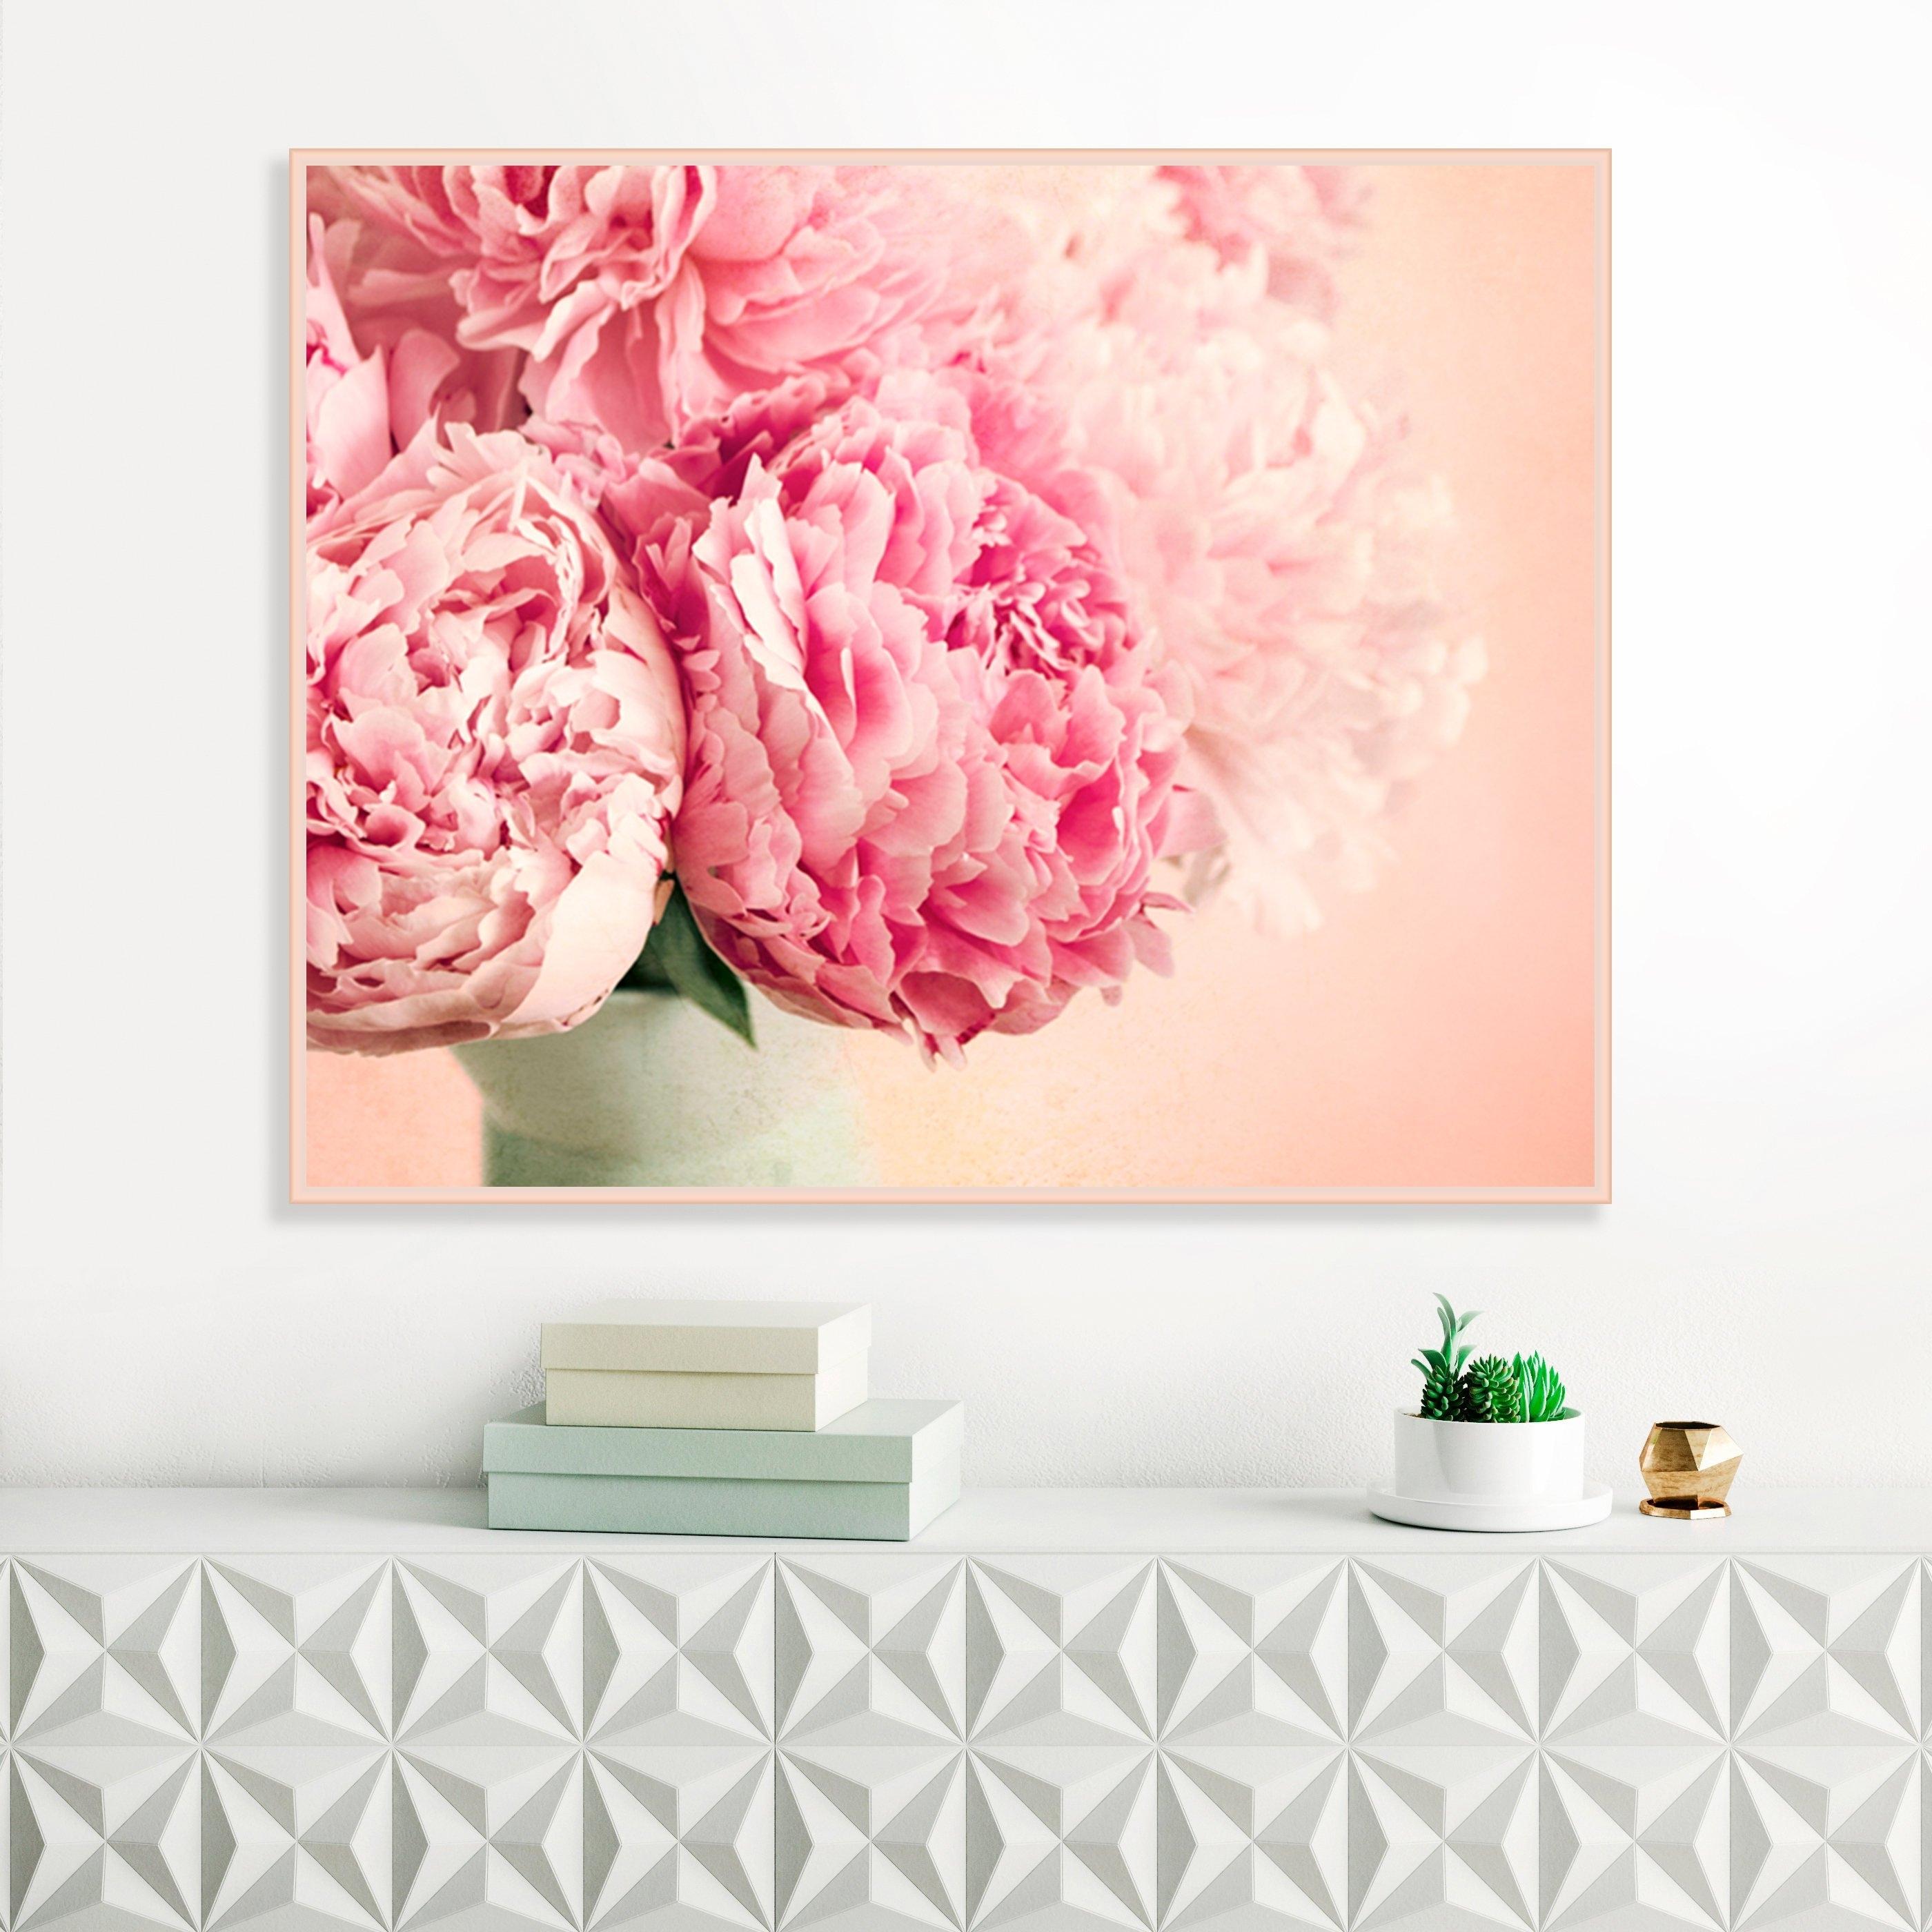 Latest Pink Wall Art Regarding Pink Peonies, Flower Prints, Blush Pink Wall Art, Peonies Still Life (View 9 of 15)